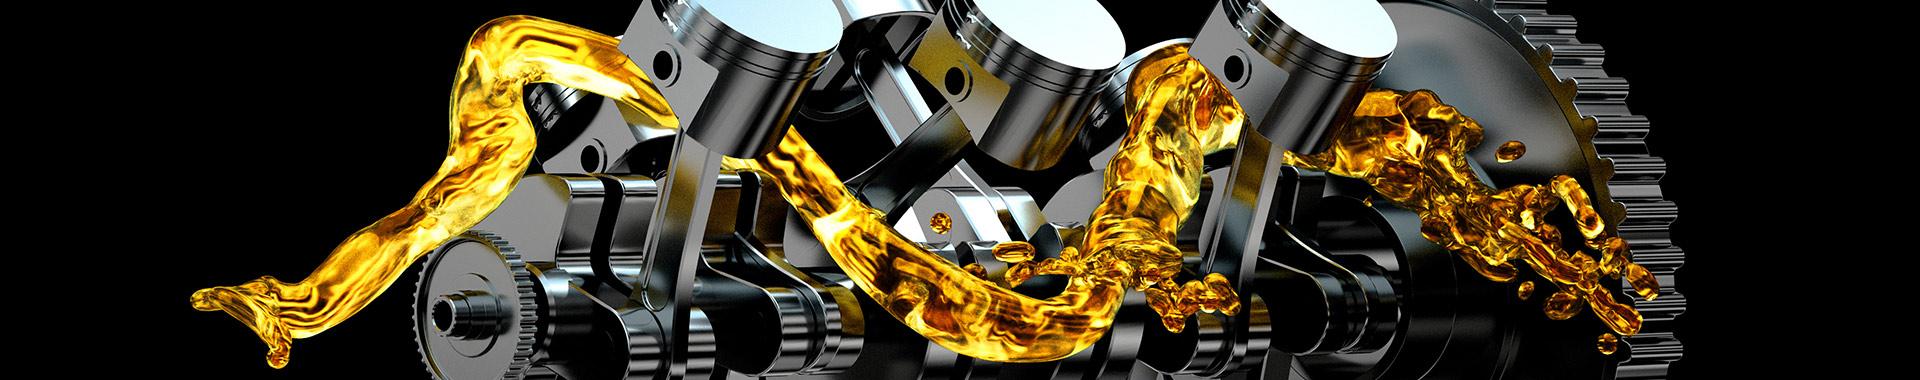 Lack Of Or Bad Engine Oil